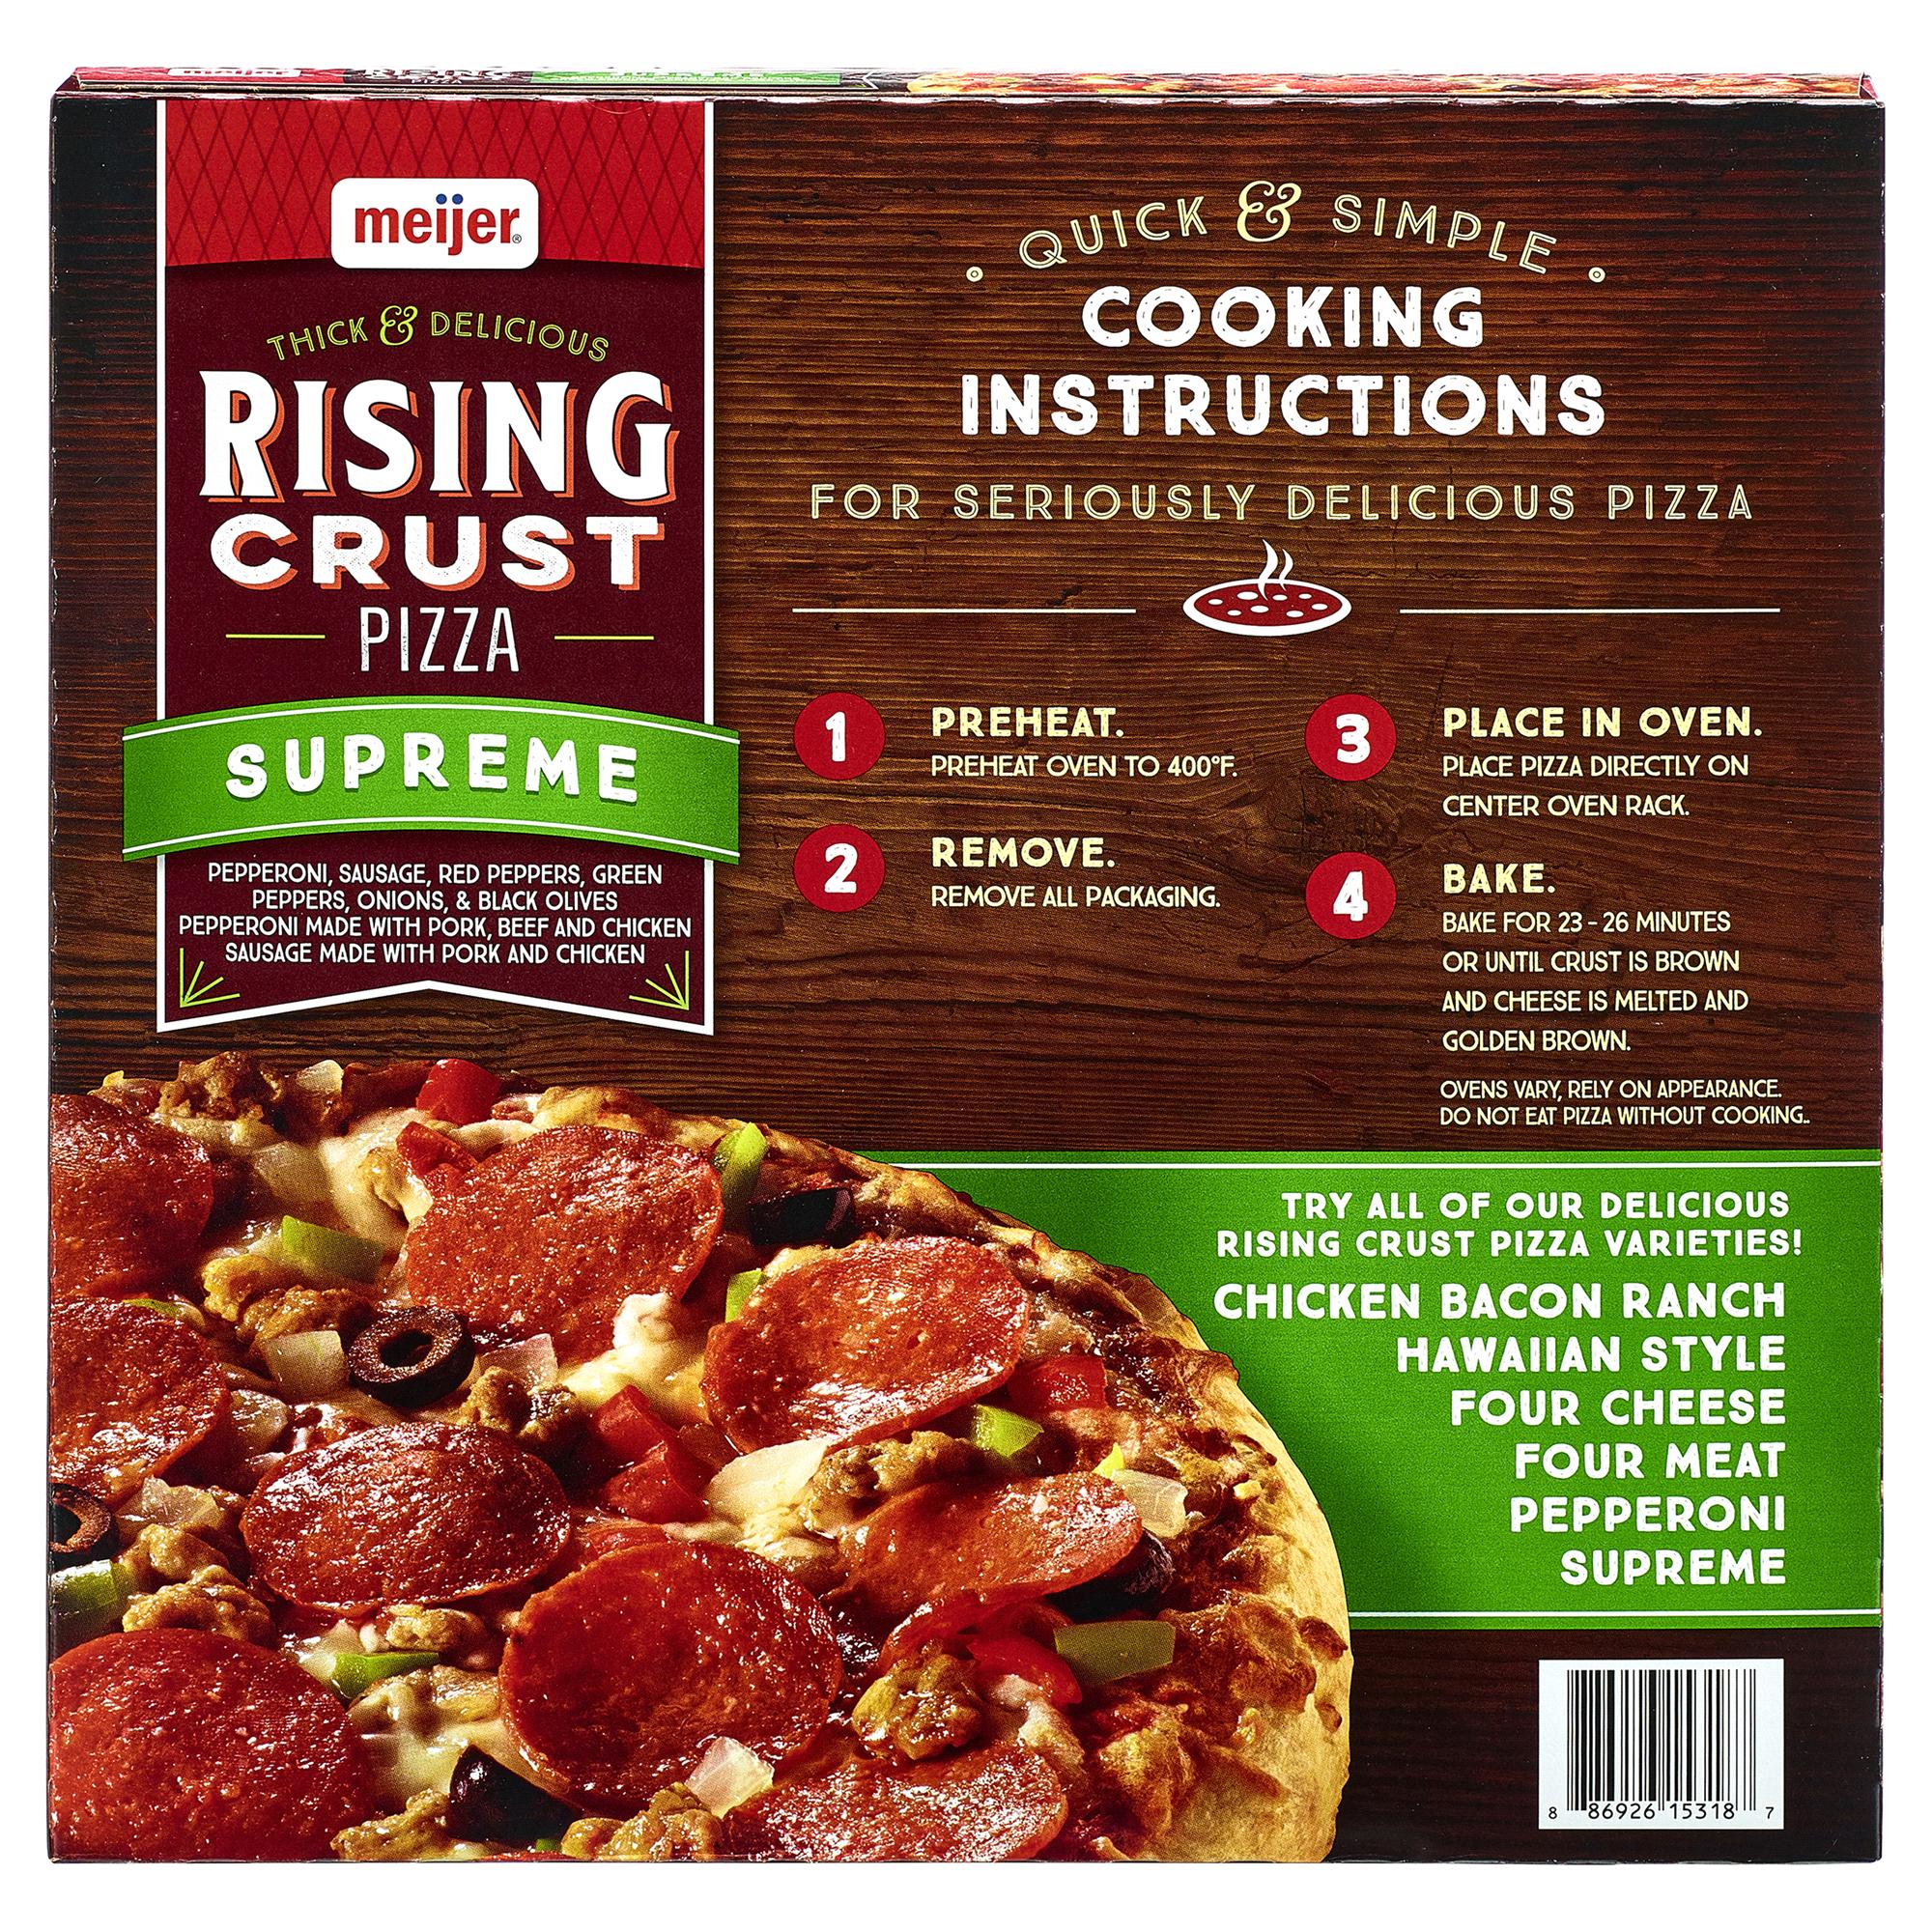 Meijer Rising Crust Supreme Pizza 32.7 oz. | Meijer.com